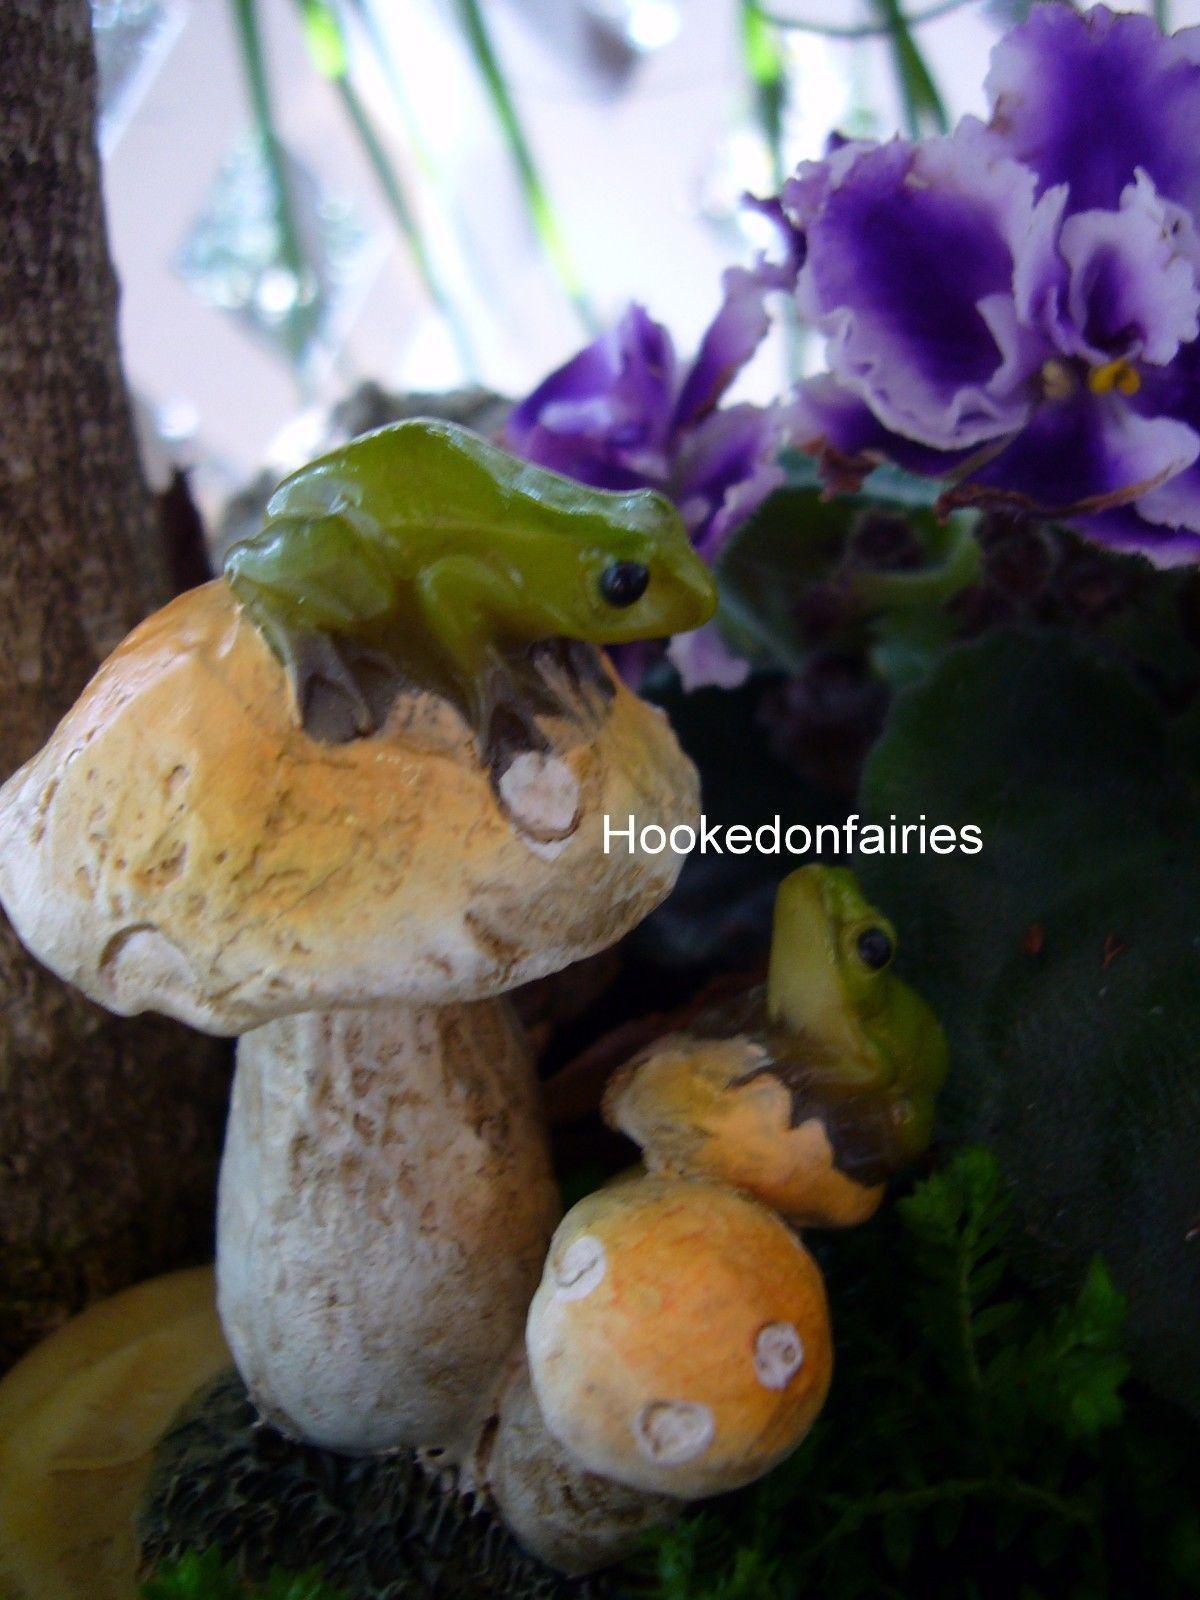 Mini Frosch auf Pilzen TO 4441 Miniatur Fee Gnom Hobbit Garten 610395044413 | Ebay#auf #ebay #fee #frosch #garten #gnom #hobbit #mini #miniatur #pilzen